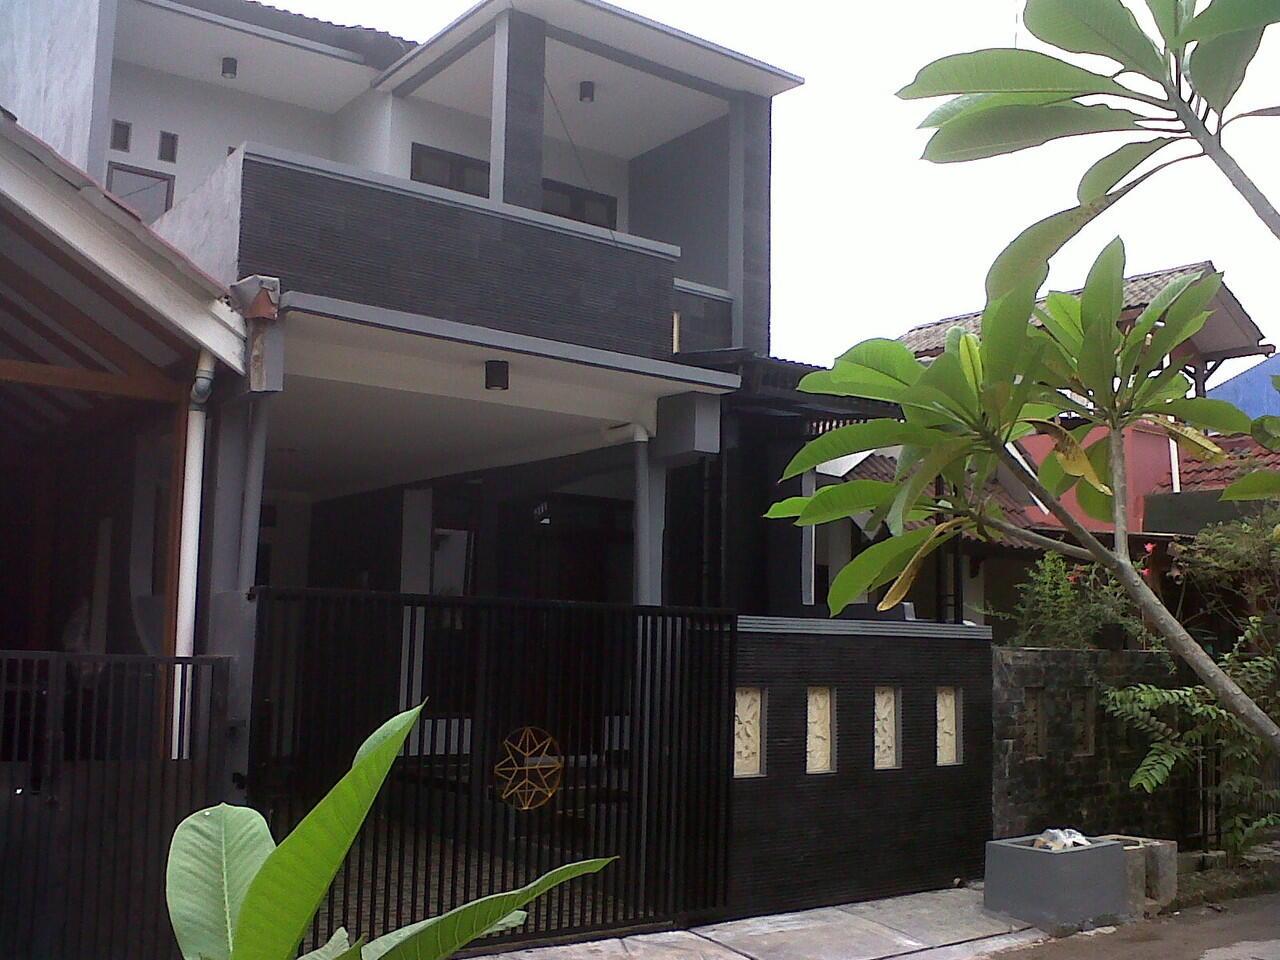 [dijual] Rumah murah minimalis di Bukit Cimanggu City Bogor